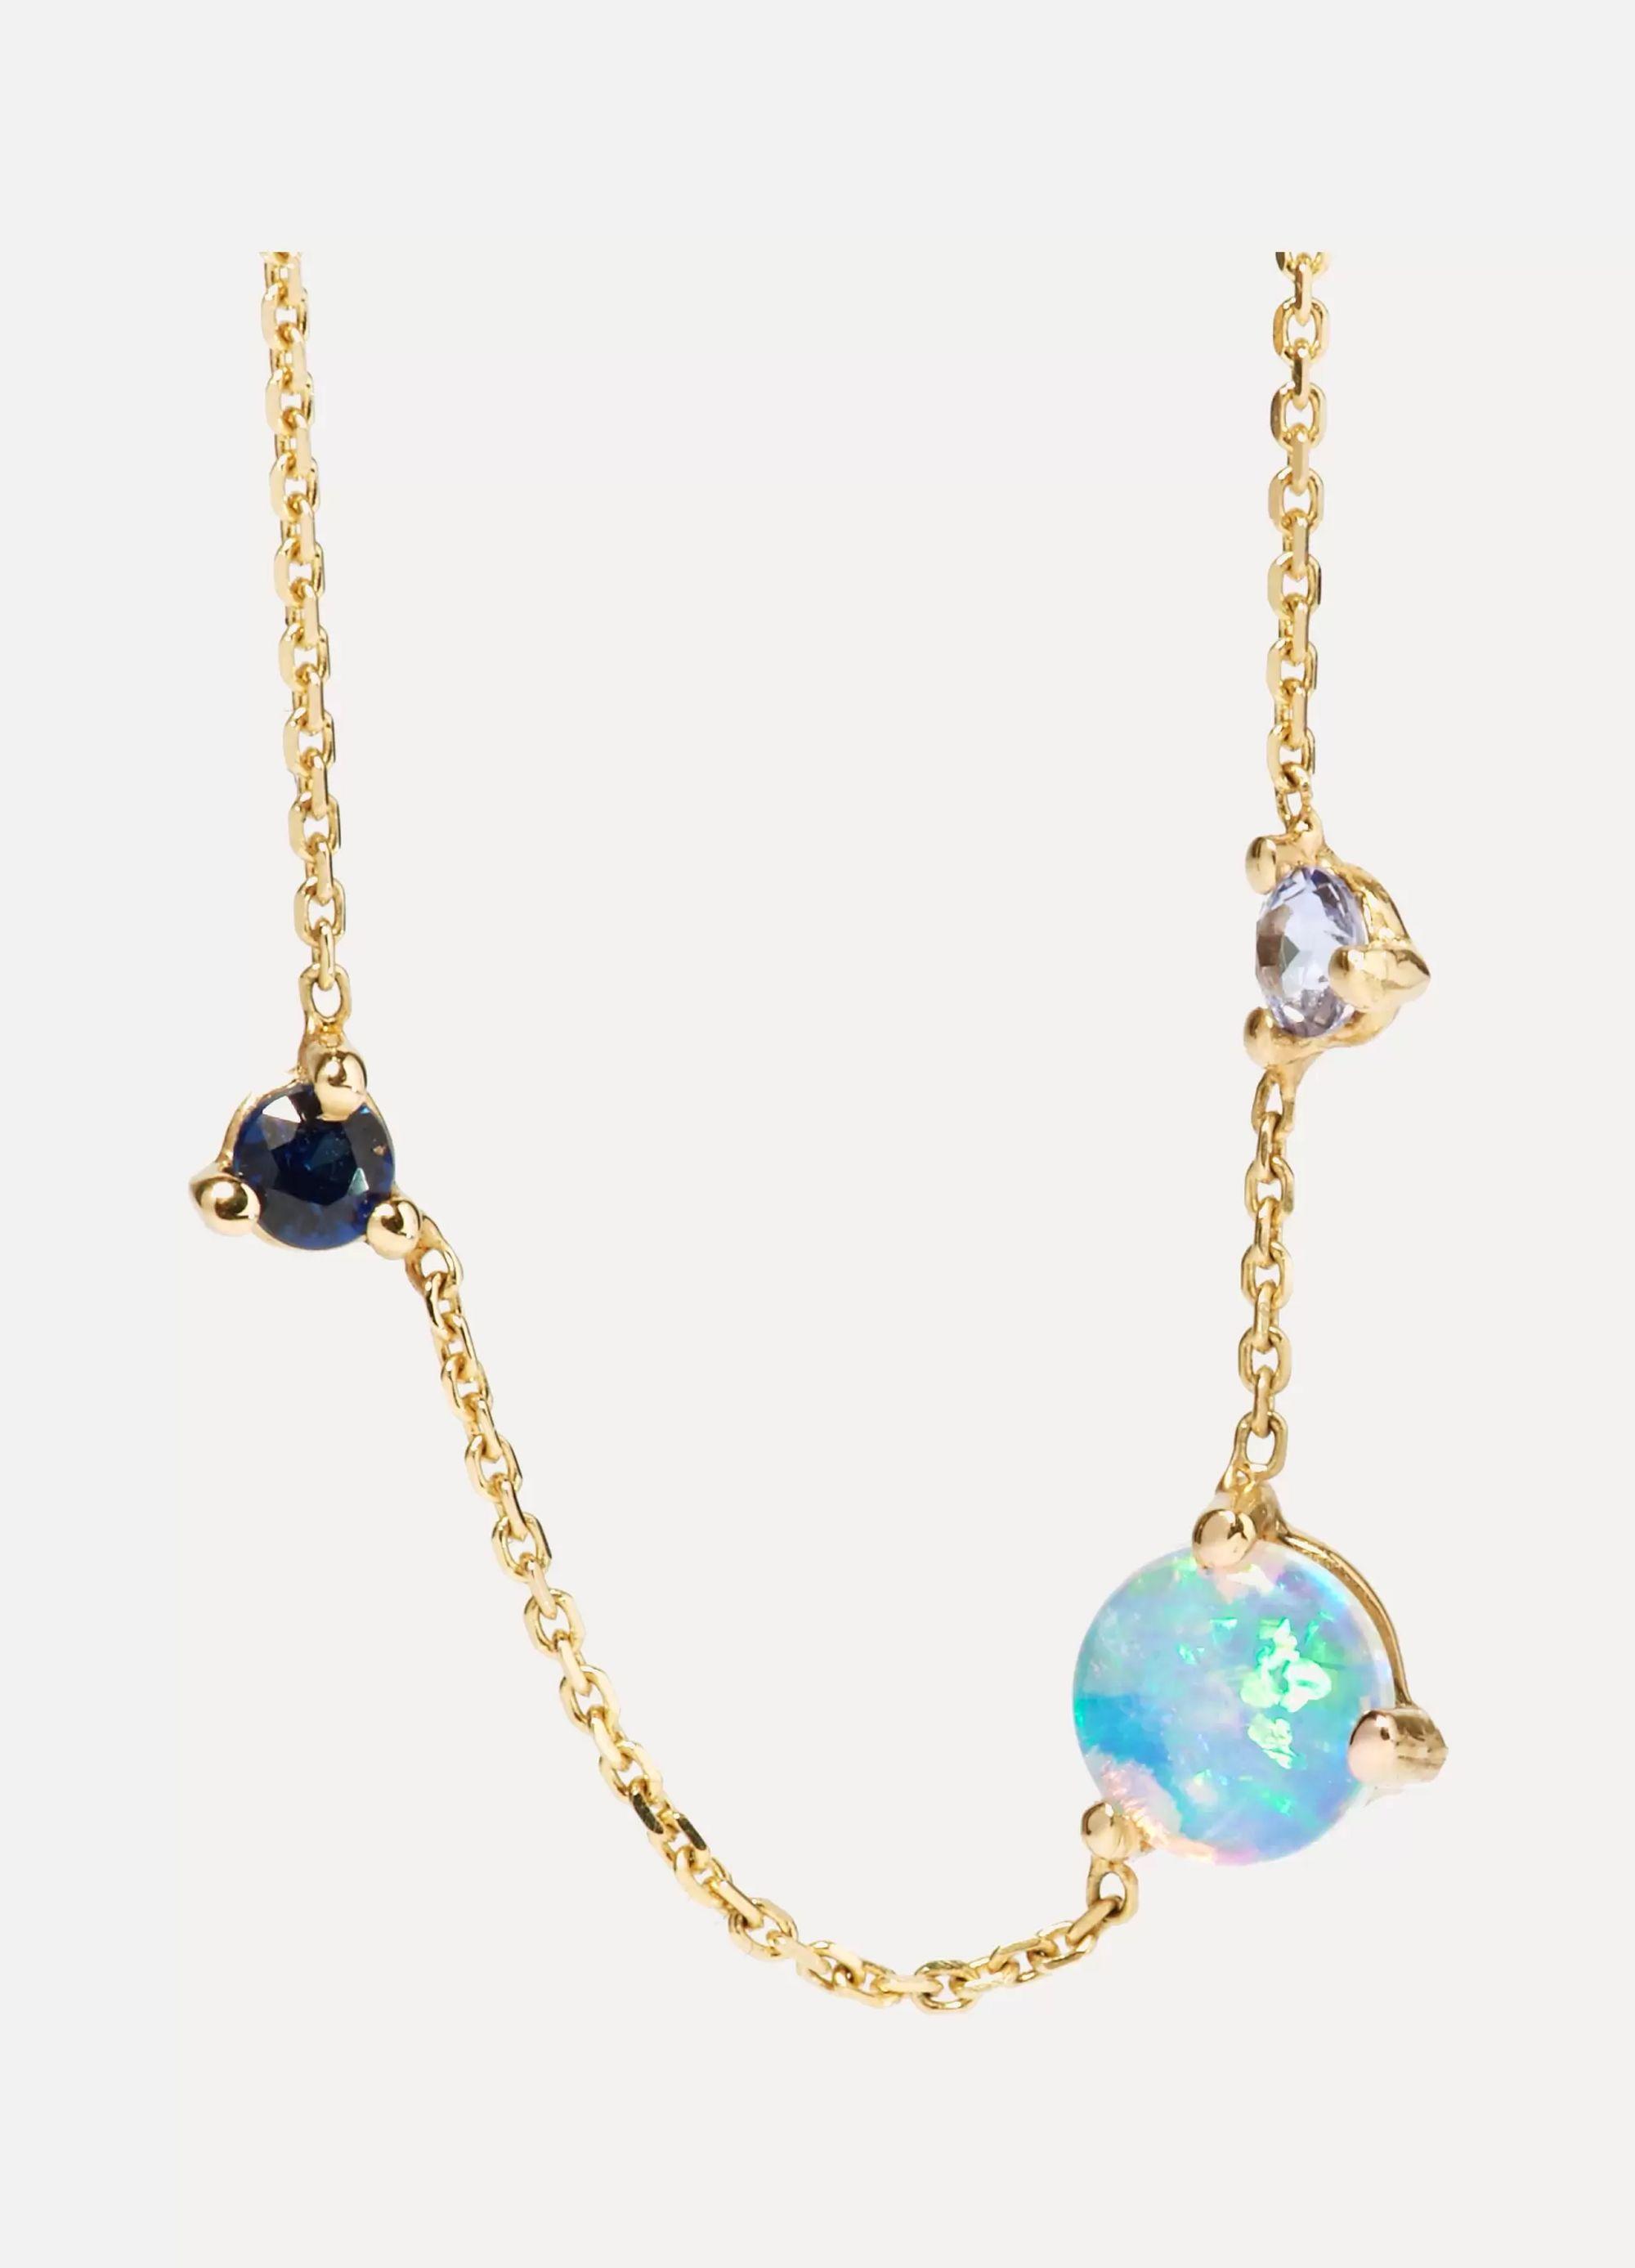 Wwake Three Step gold multi-stone necklace